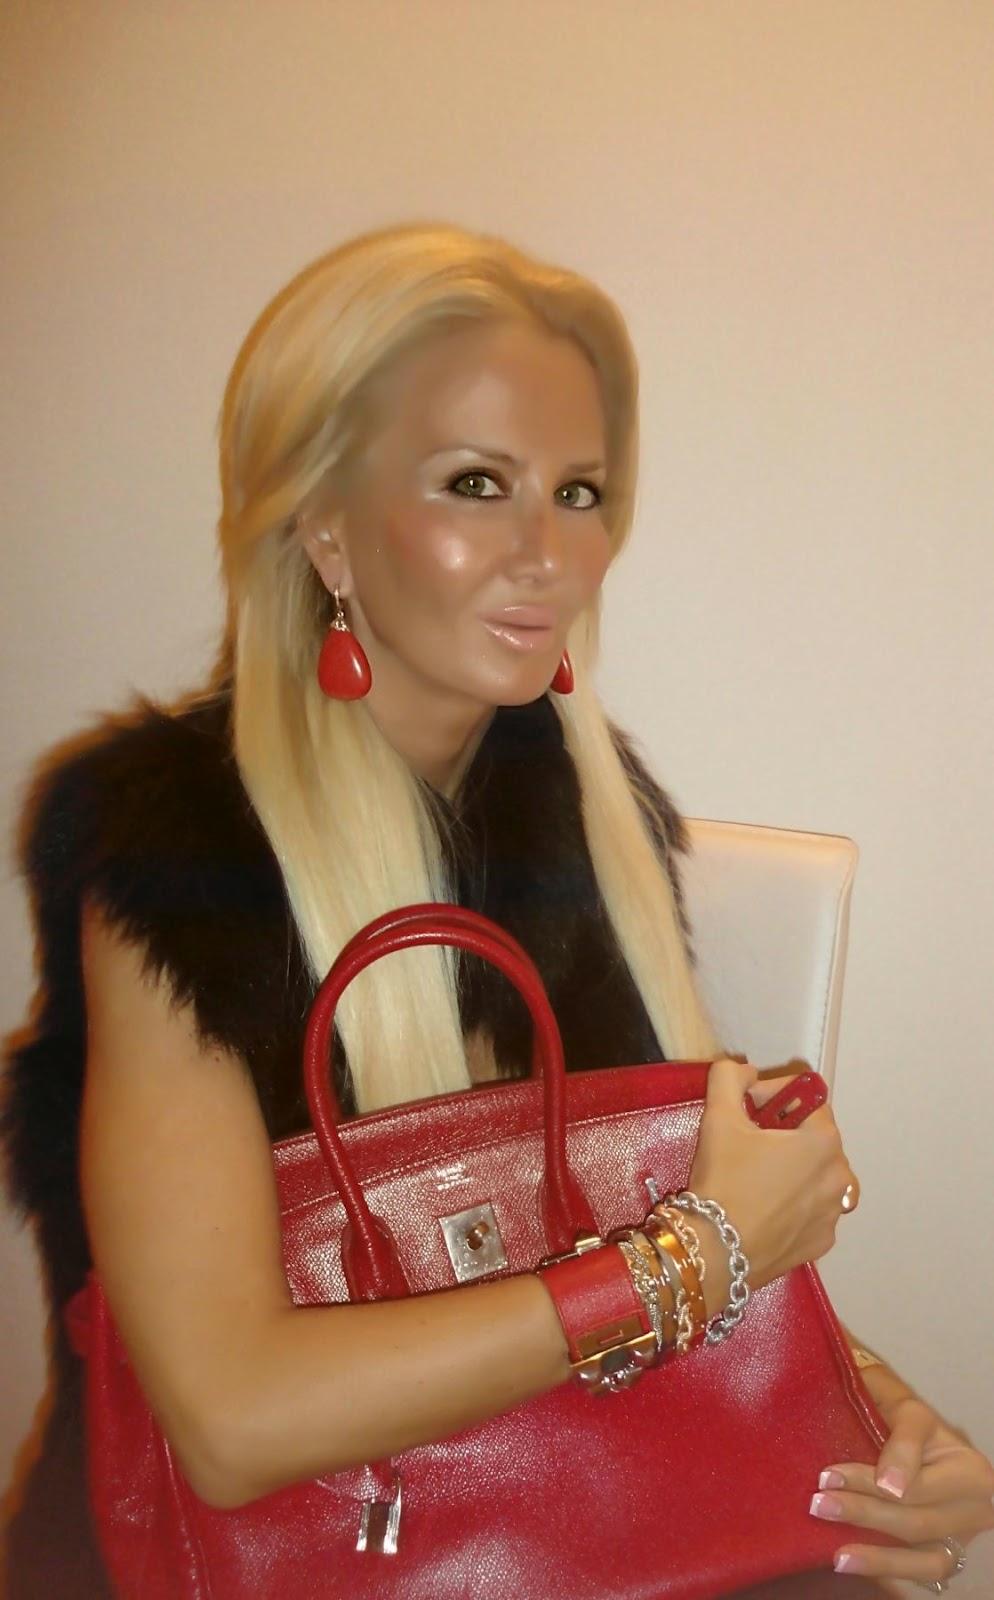 Beautiful Long Hair In The Press Ingrid Levy Styleworks